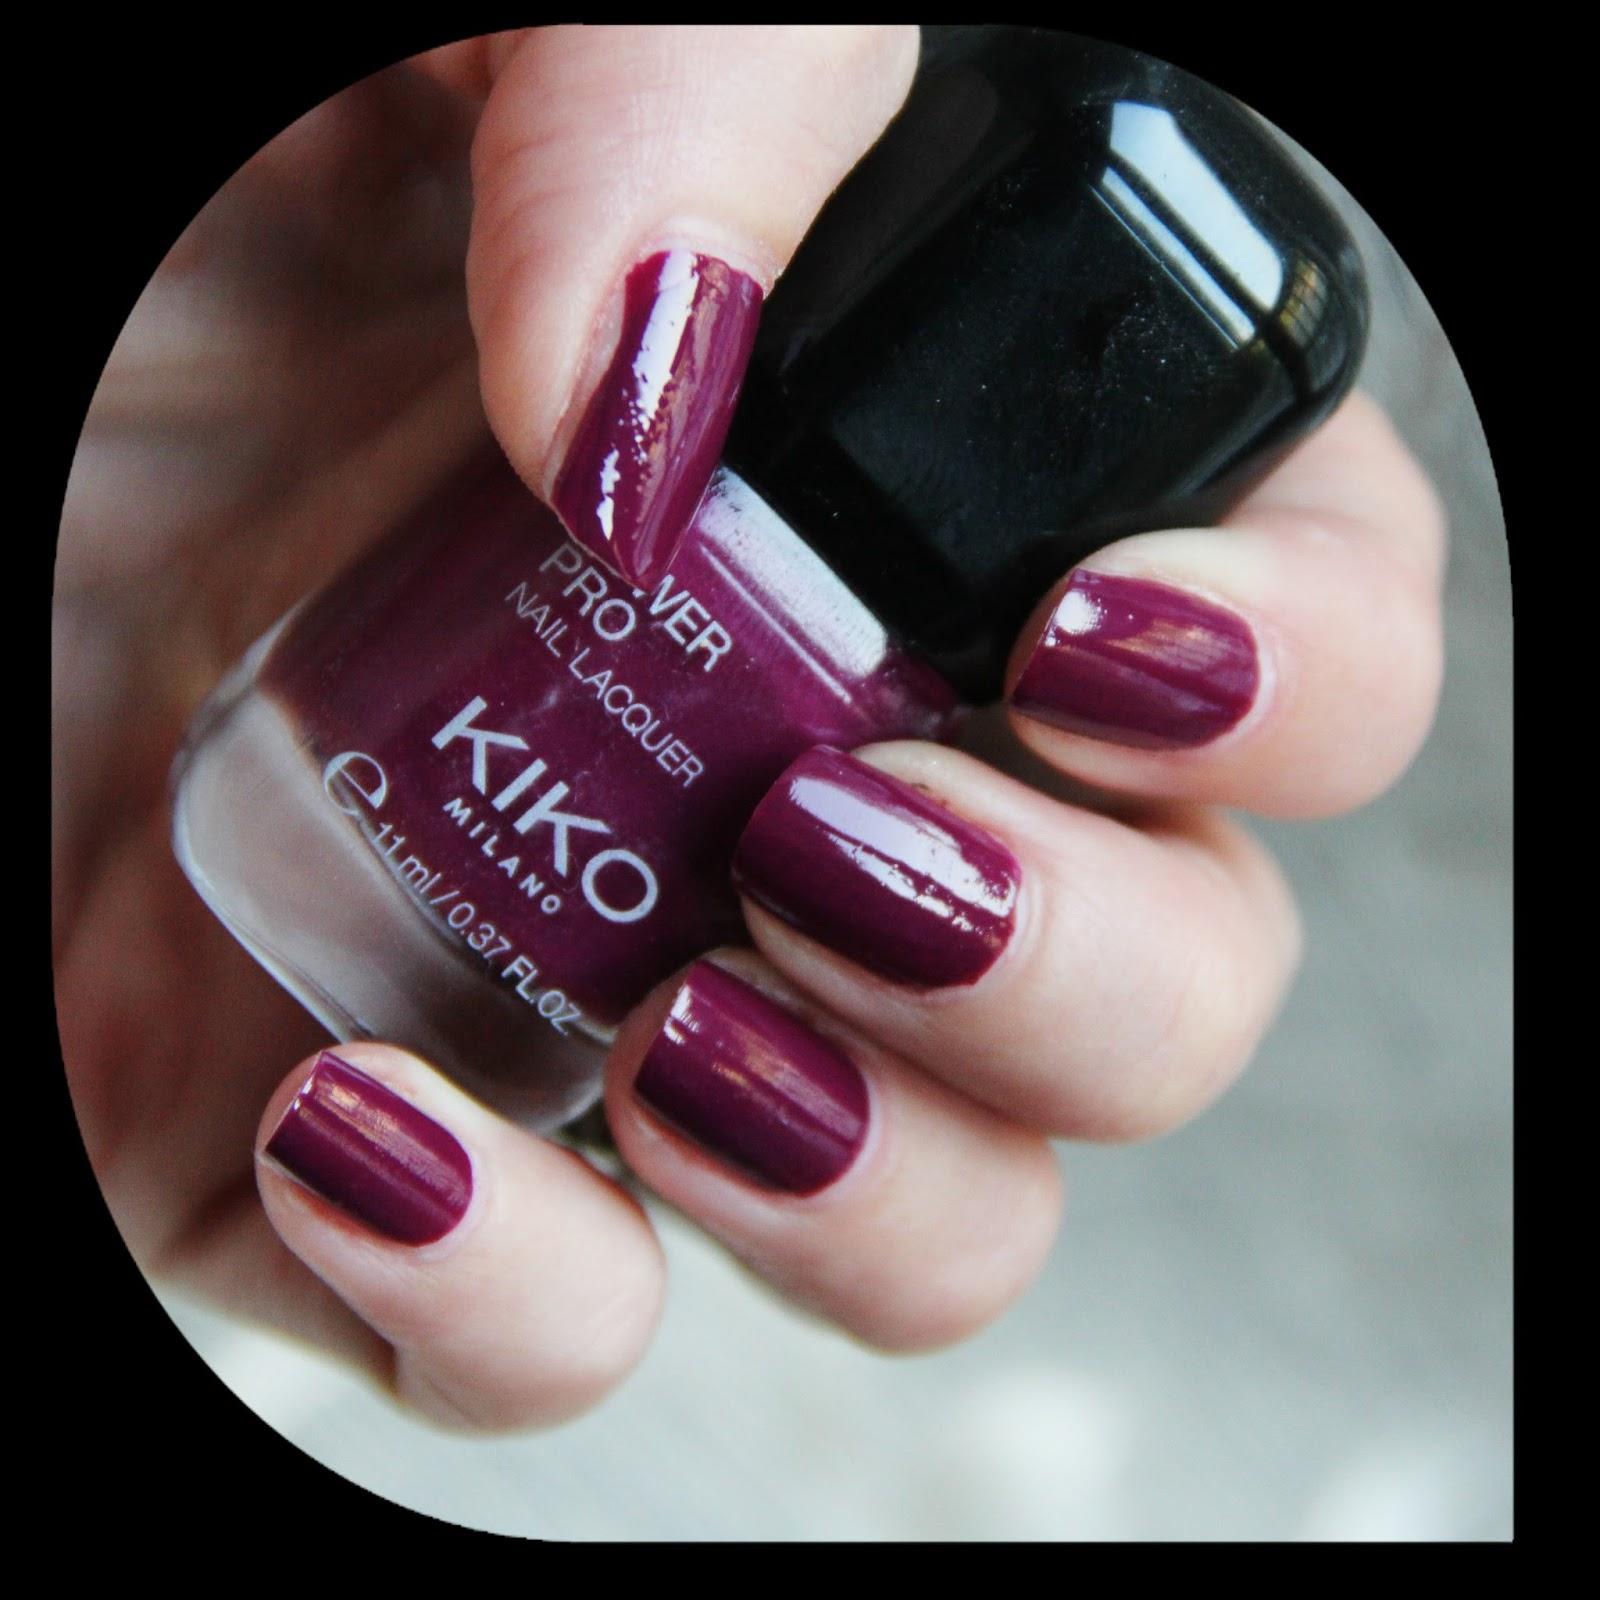 Notd Kiko Pro Nail Lacquer 20 Ciclamino